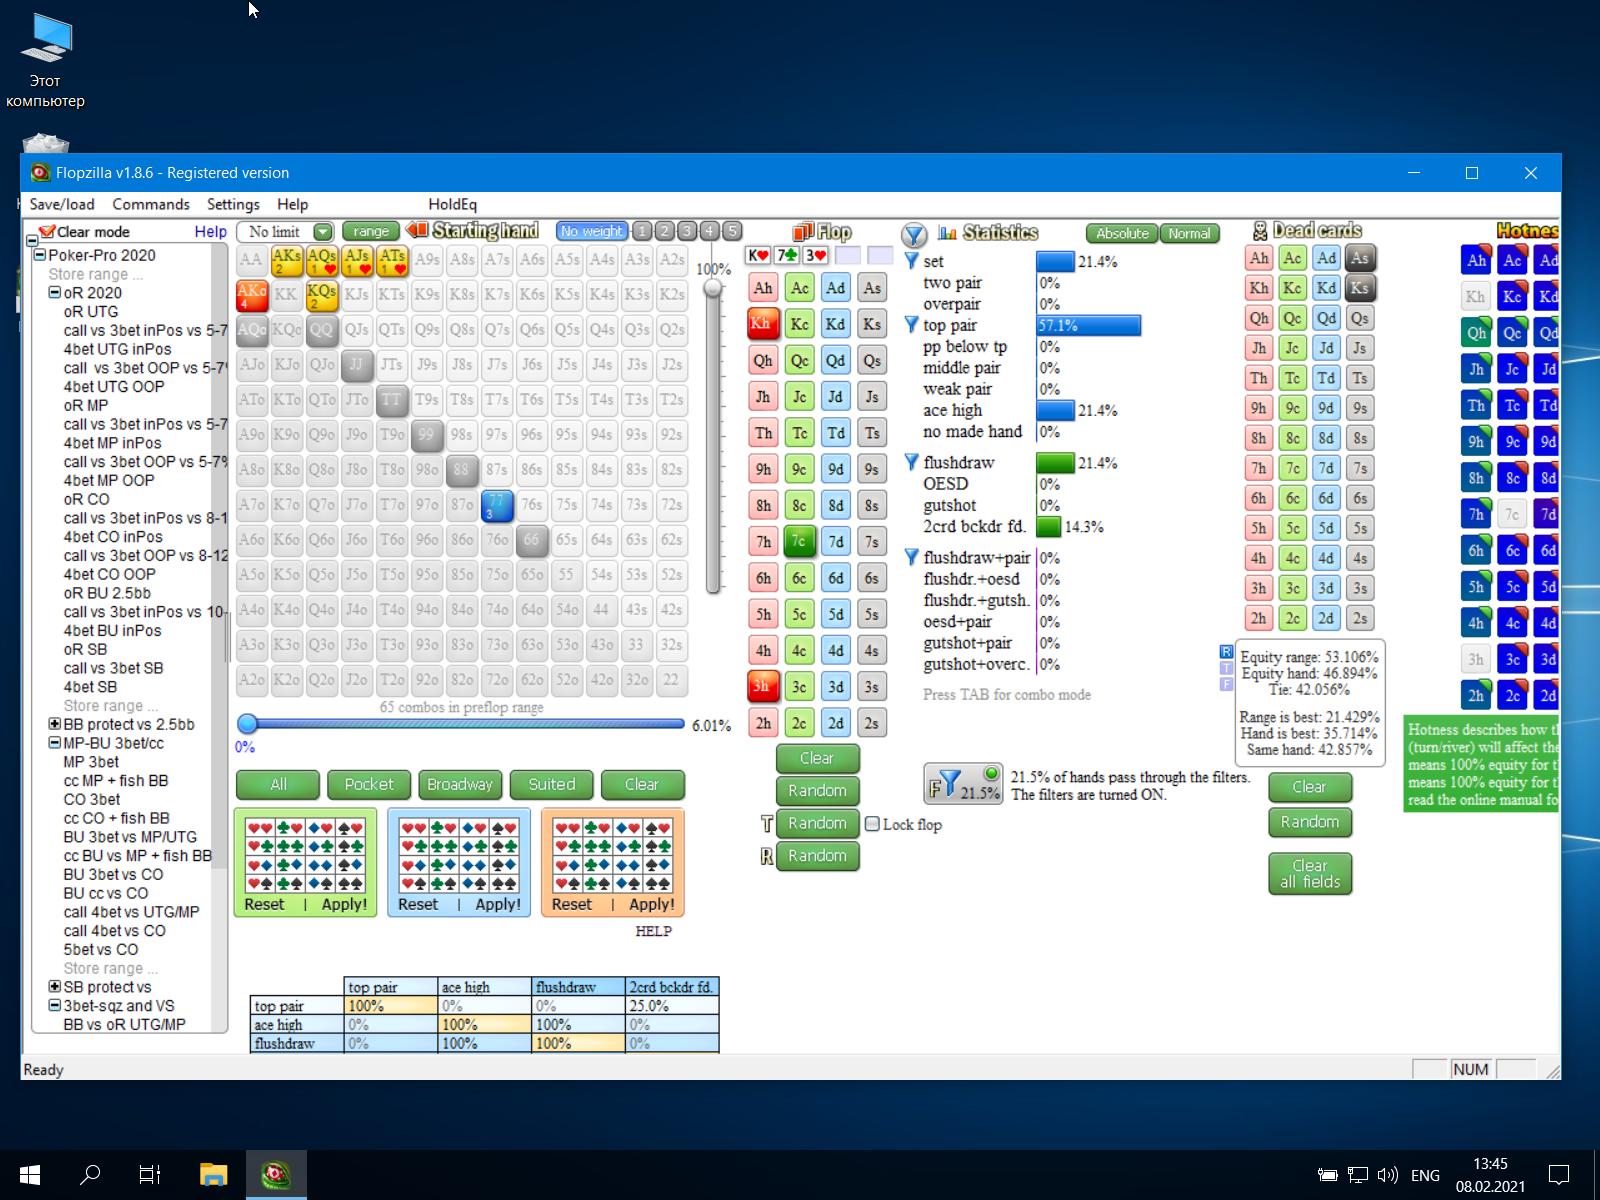 virtualboxwin-10080220211345491612781163.png